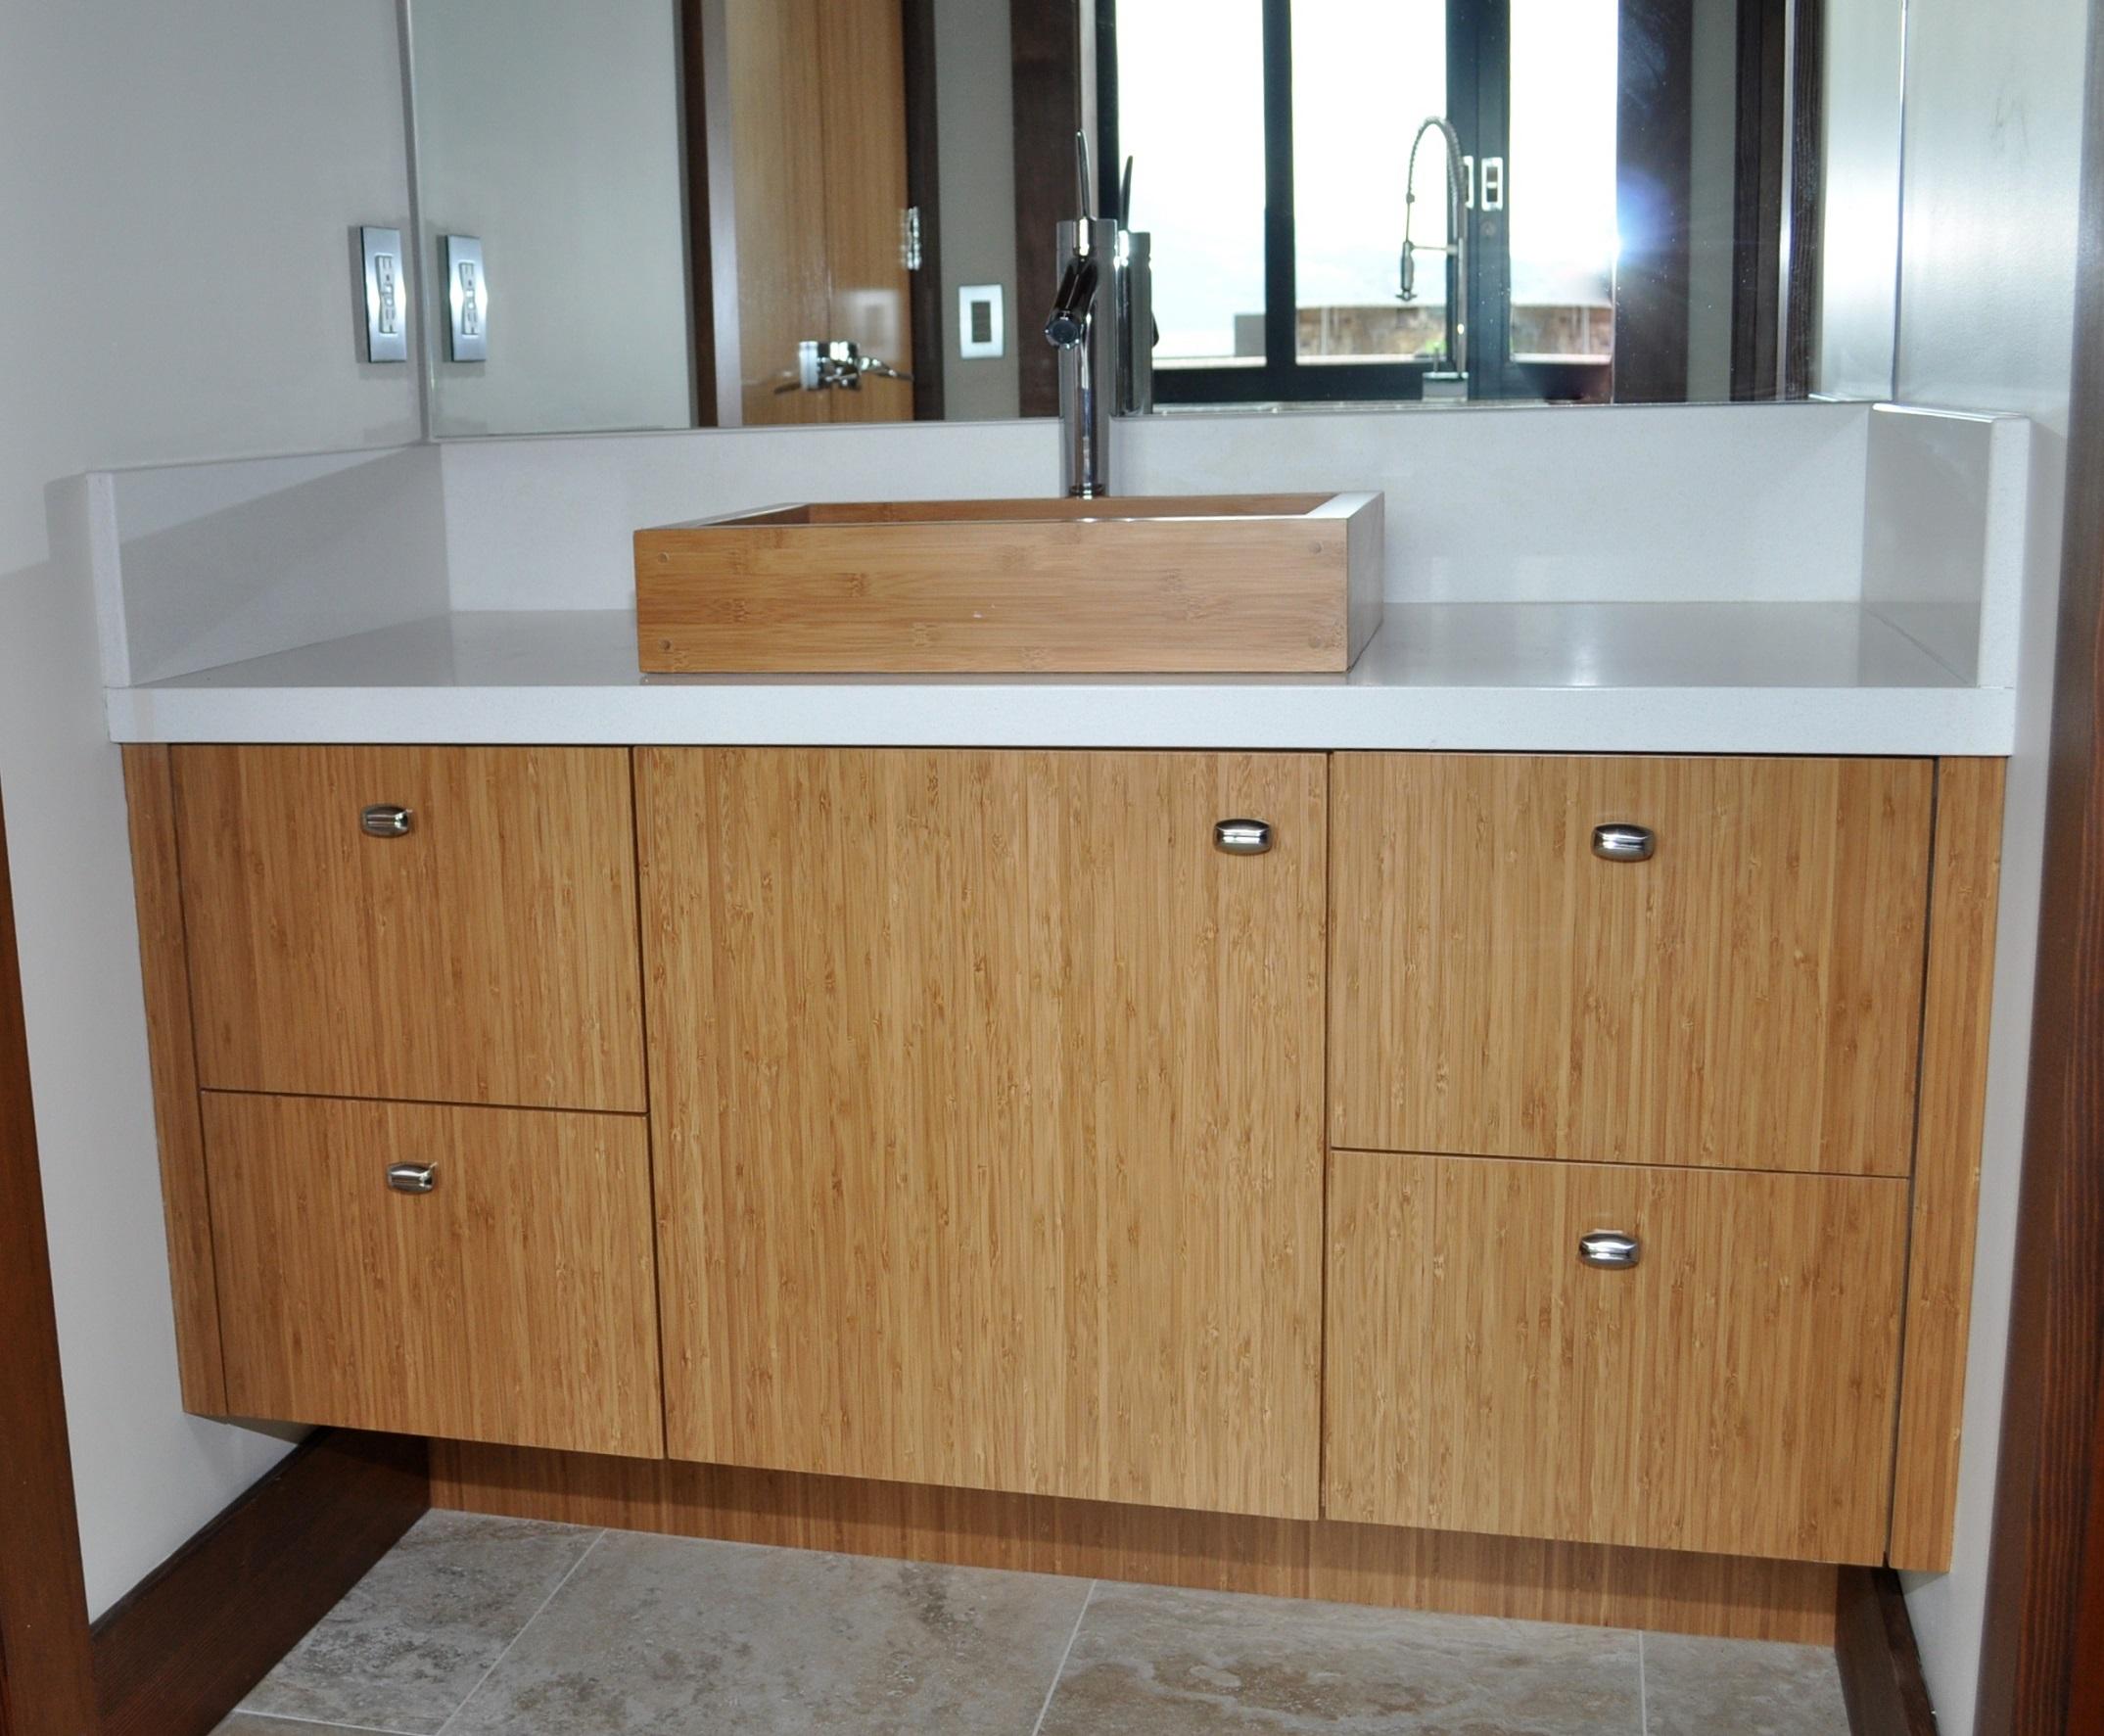 custom-bamboo-wood-modern-bath-vanity.jpg.JPG